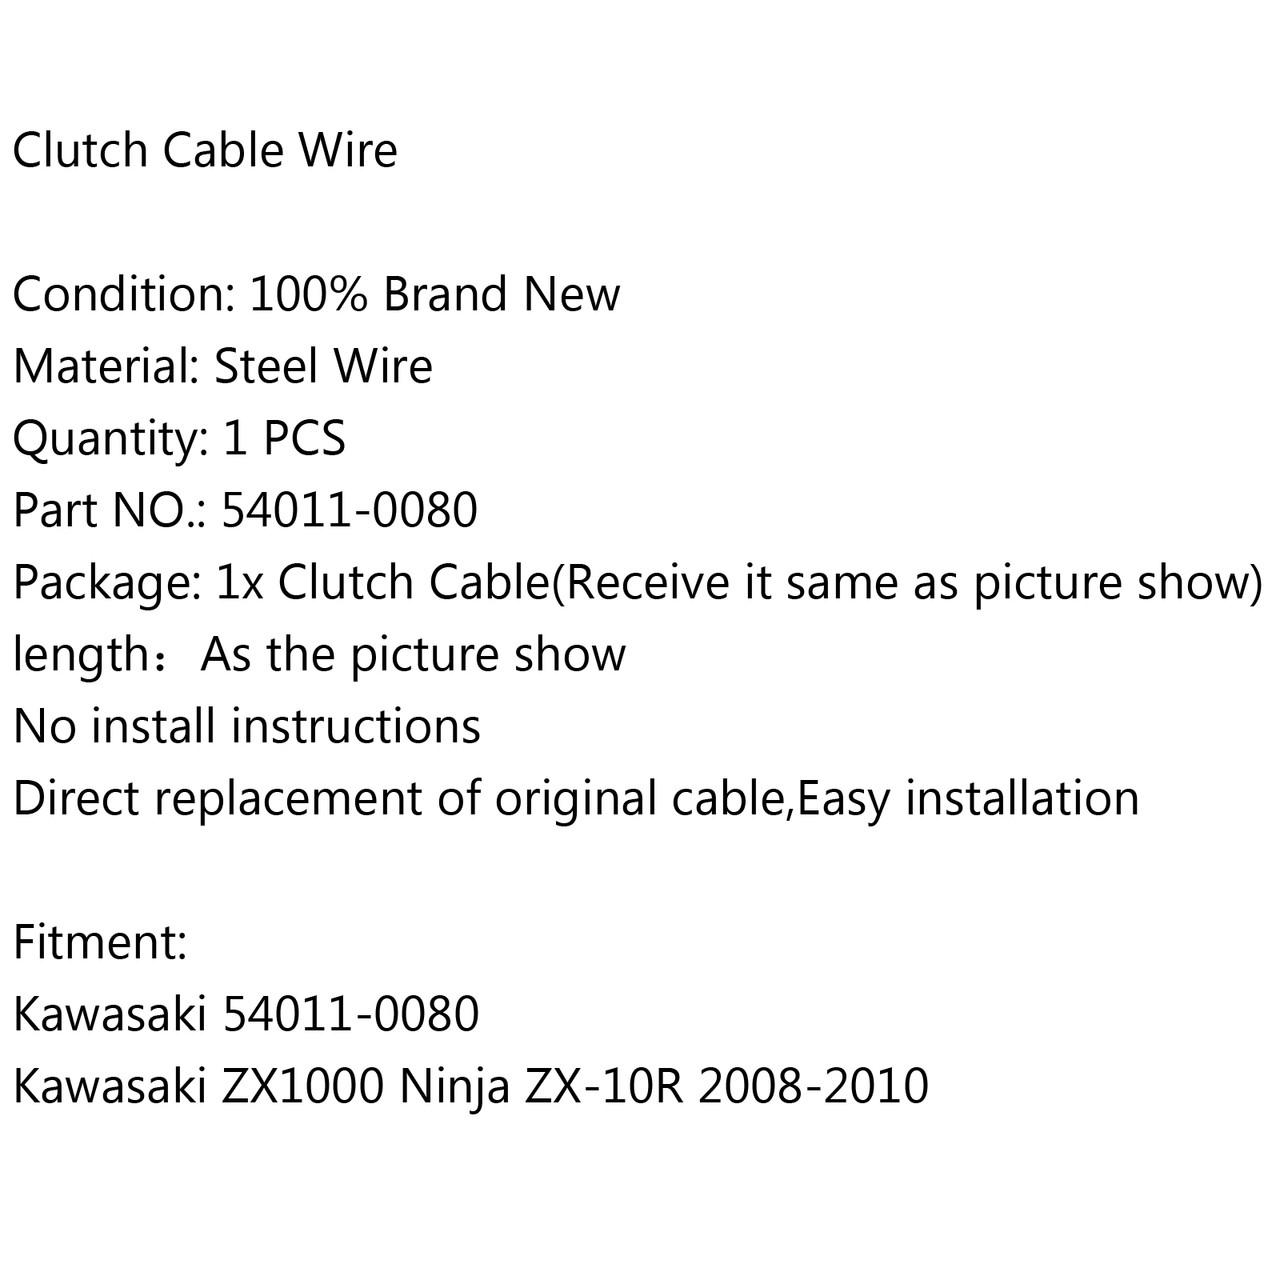 Clutch Cable Wire Steel Braided 54011-0080 Kawasaki ZX1000 Ninja ZX-10R (2008-2010)